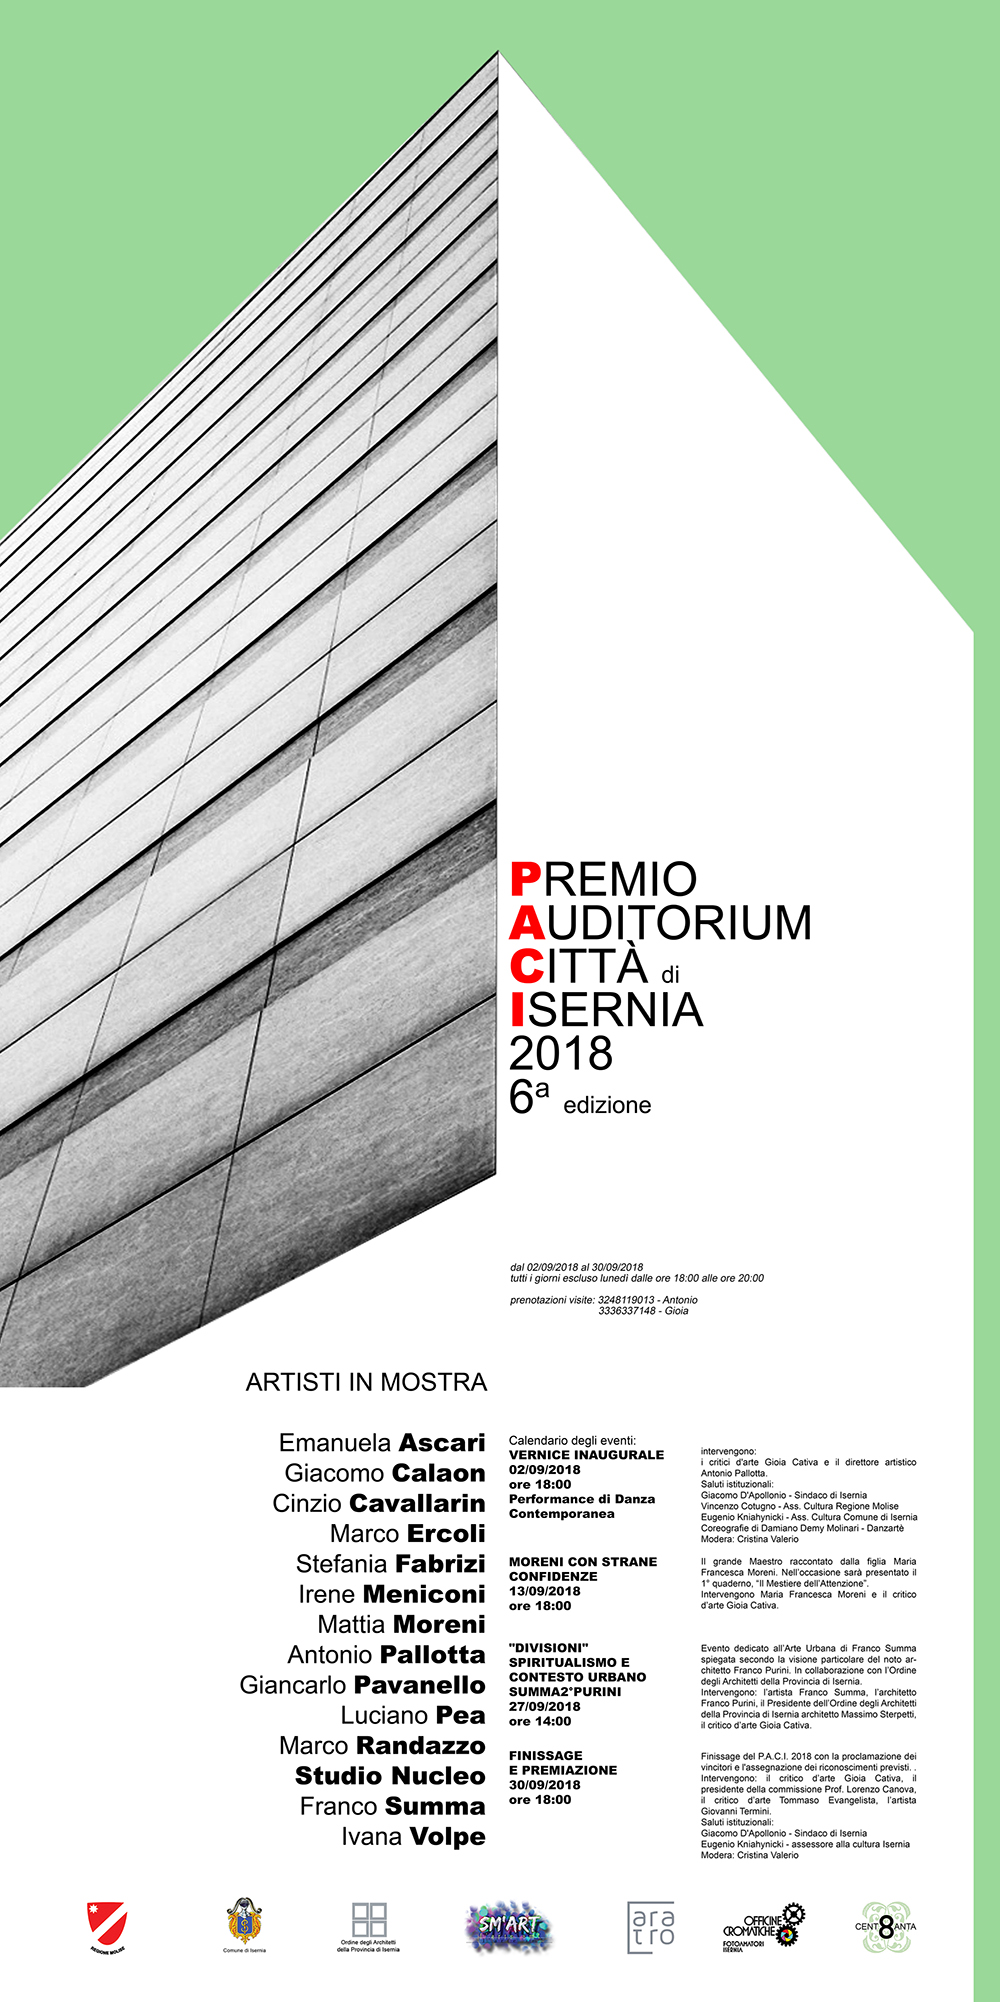 StudioNucleo_premio PACI2018_isernia_1000px